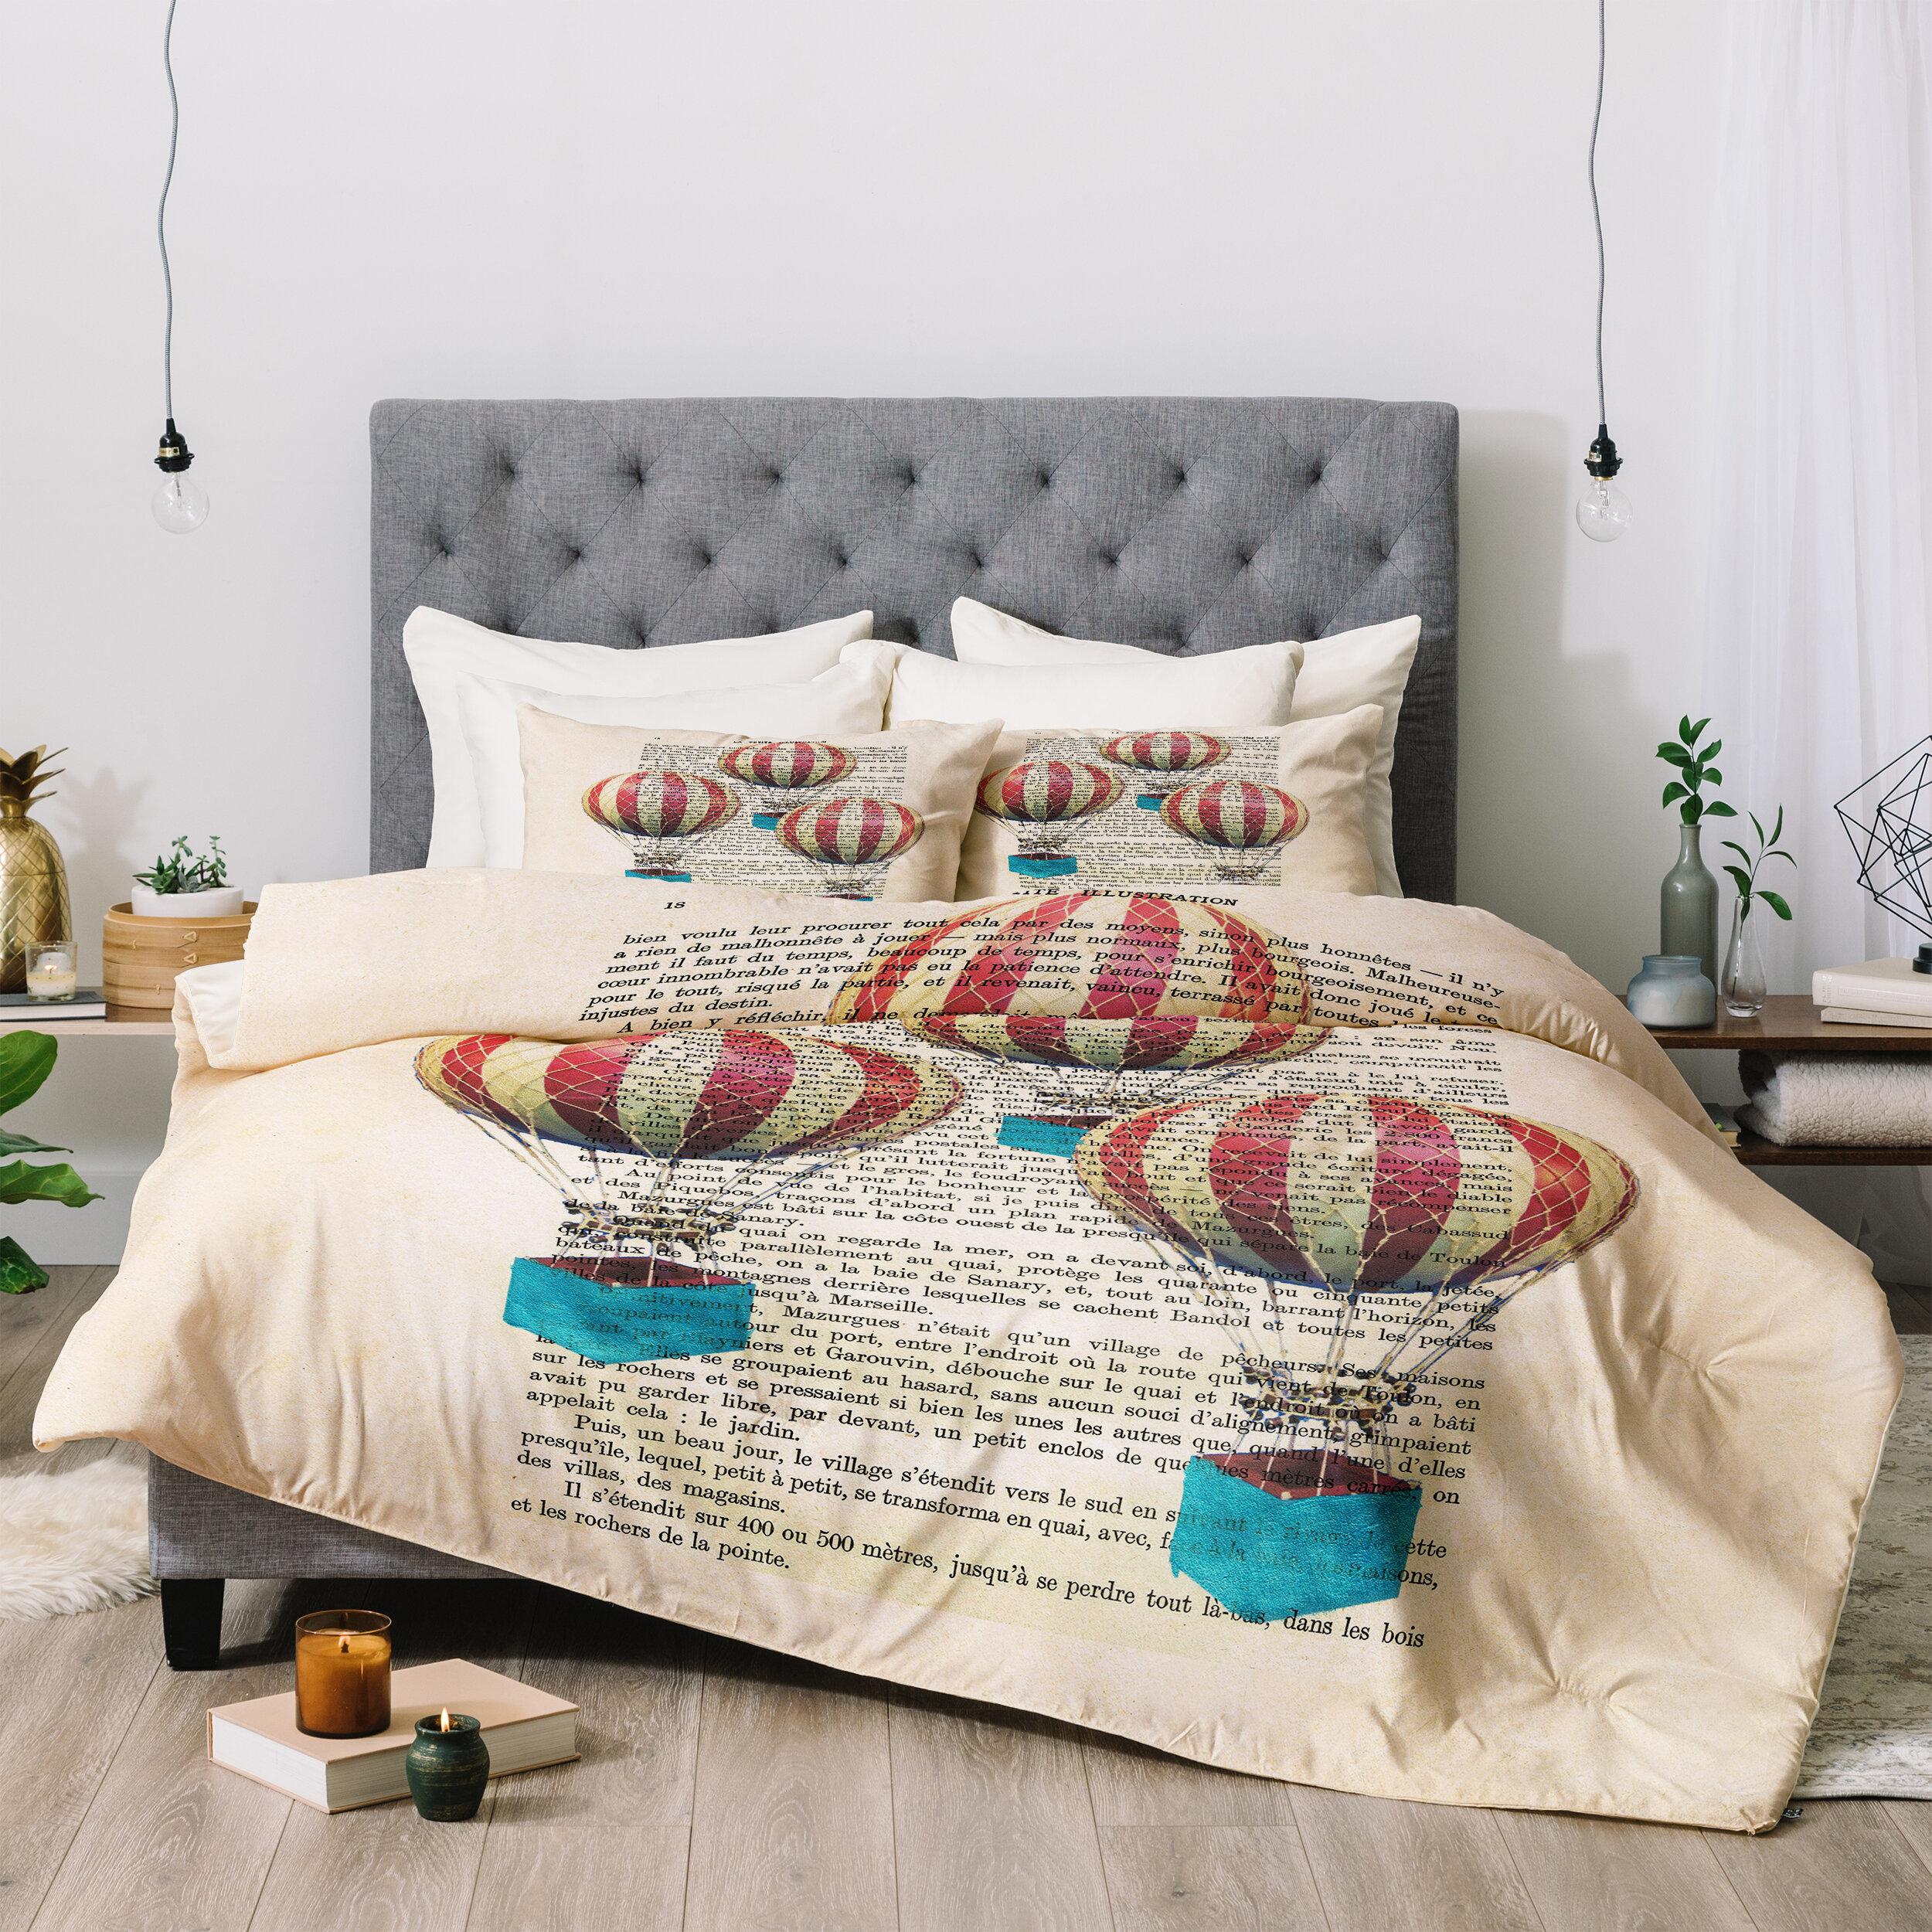 East Urban Home 3 Piece Comforter Set Wayfair